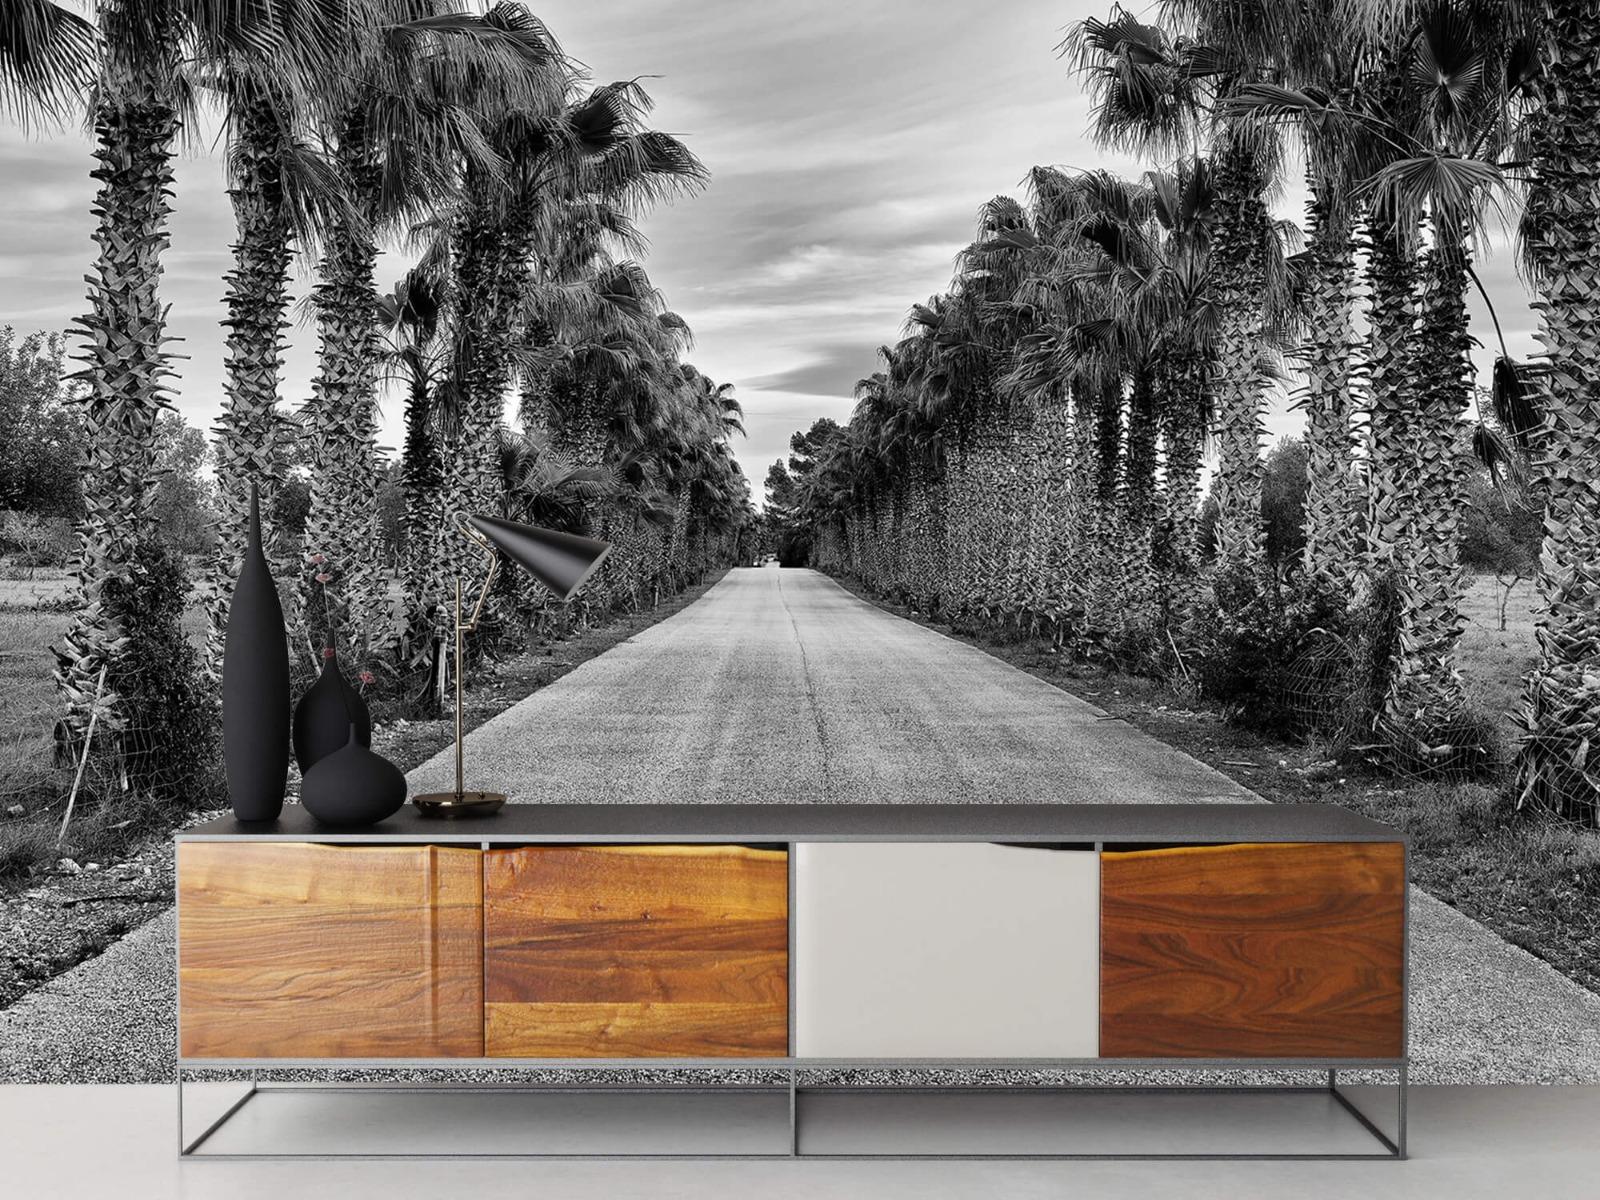 Palmbomen - Straat met palmbomen - Woonkamer 16